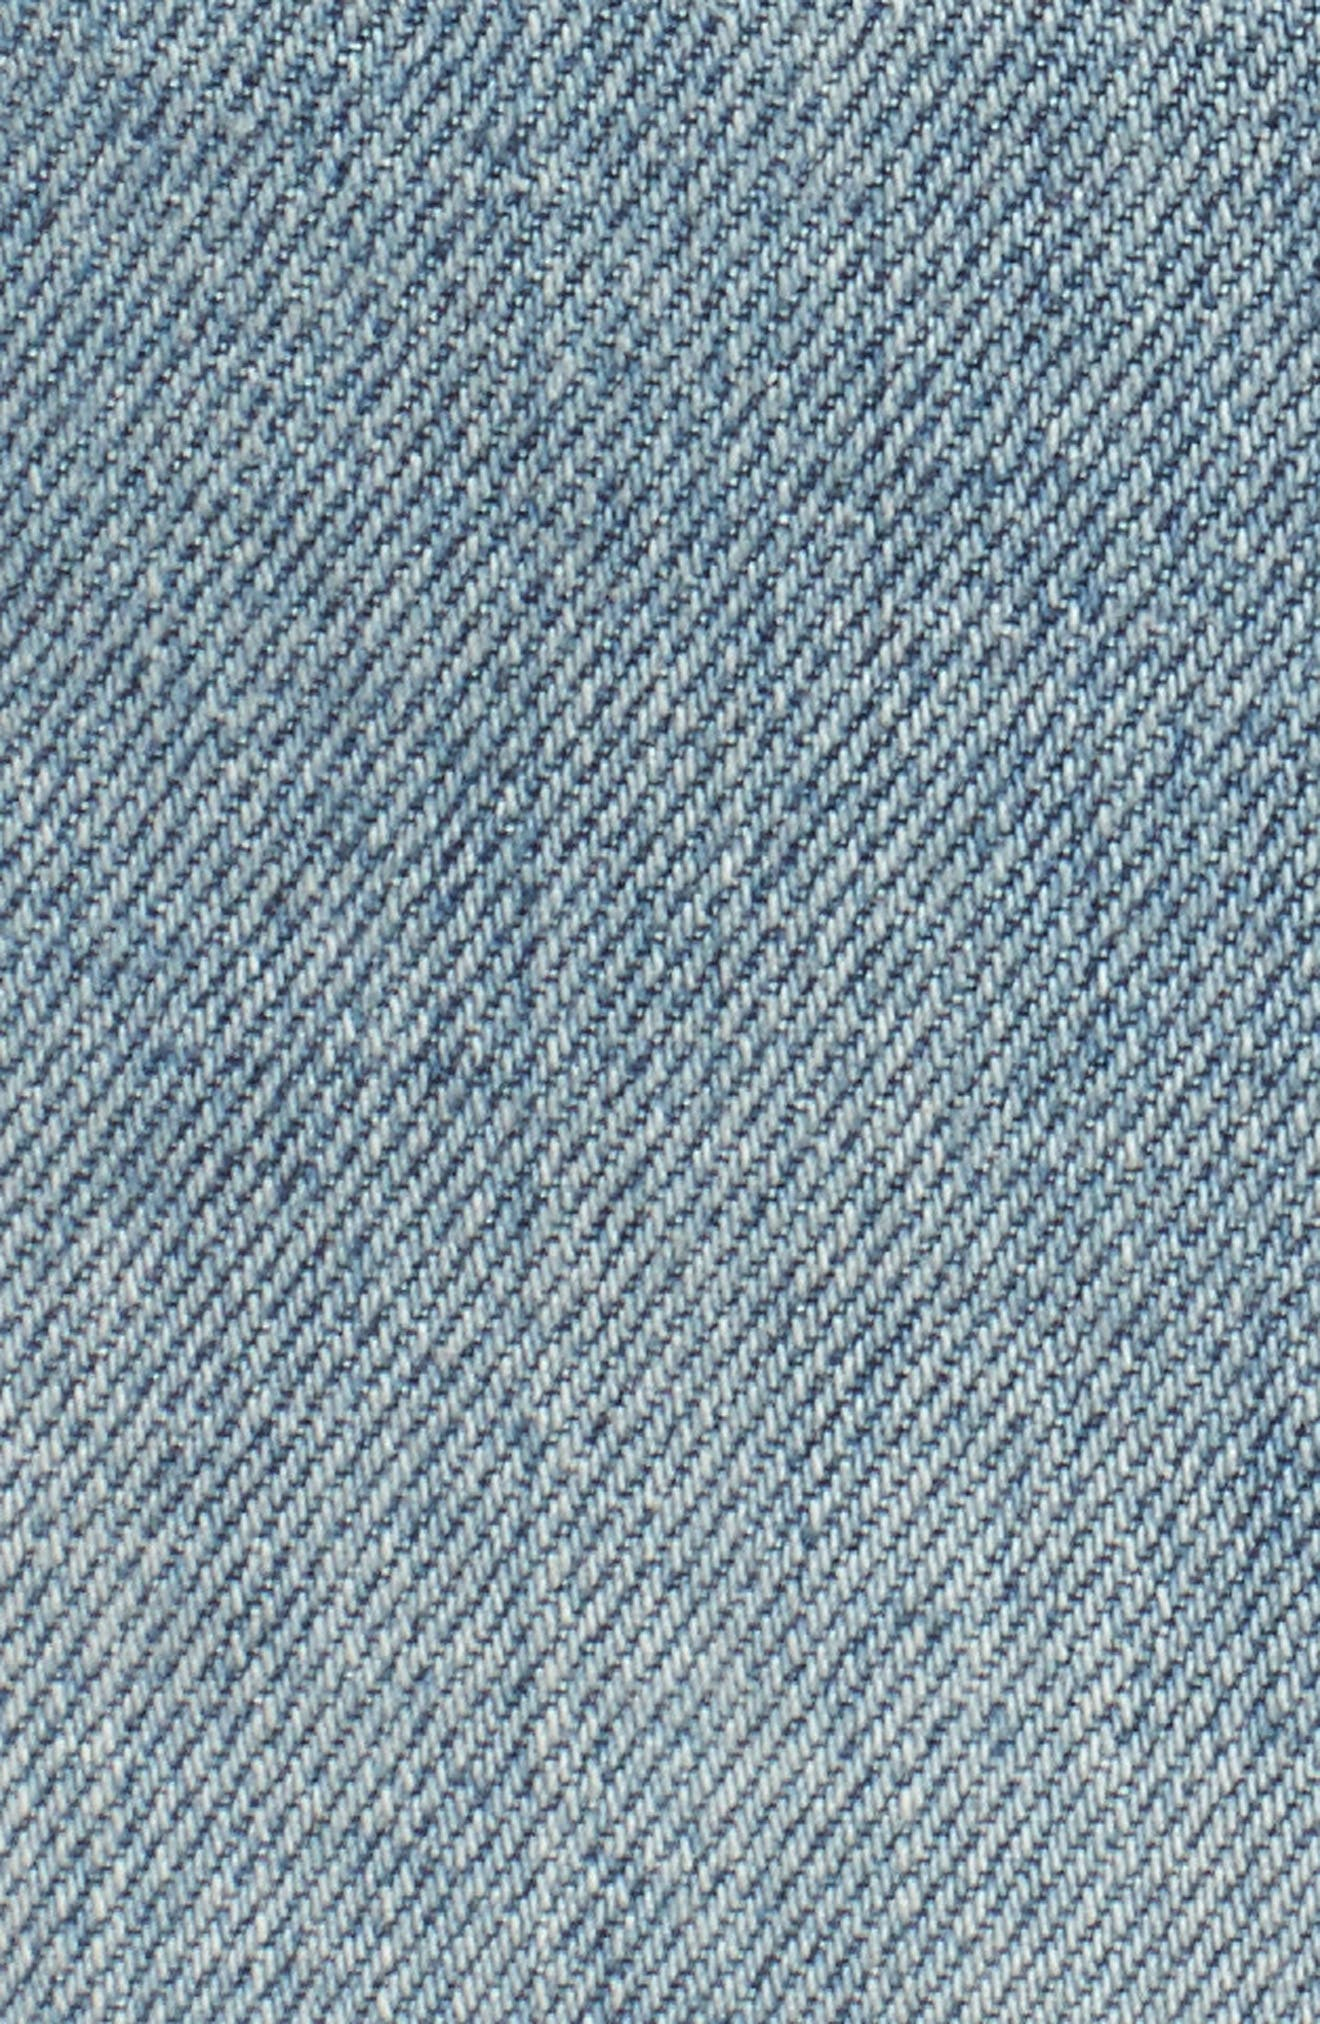 Wynonna Studded Cutoff Denim Miniskirt,                             Alternate thumbnail 5, color,                             Med Vintage All Over Studded